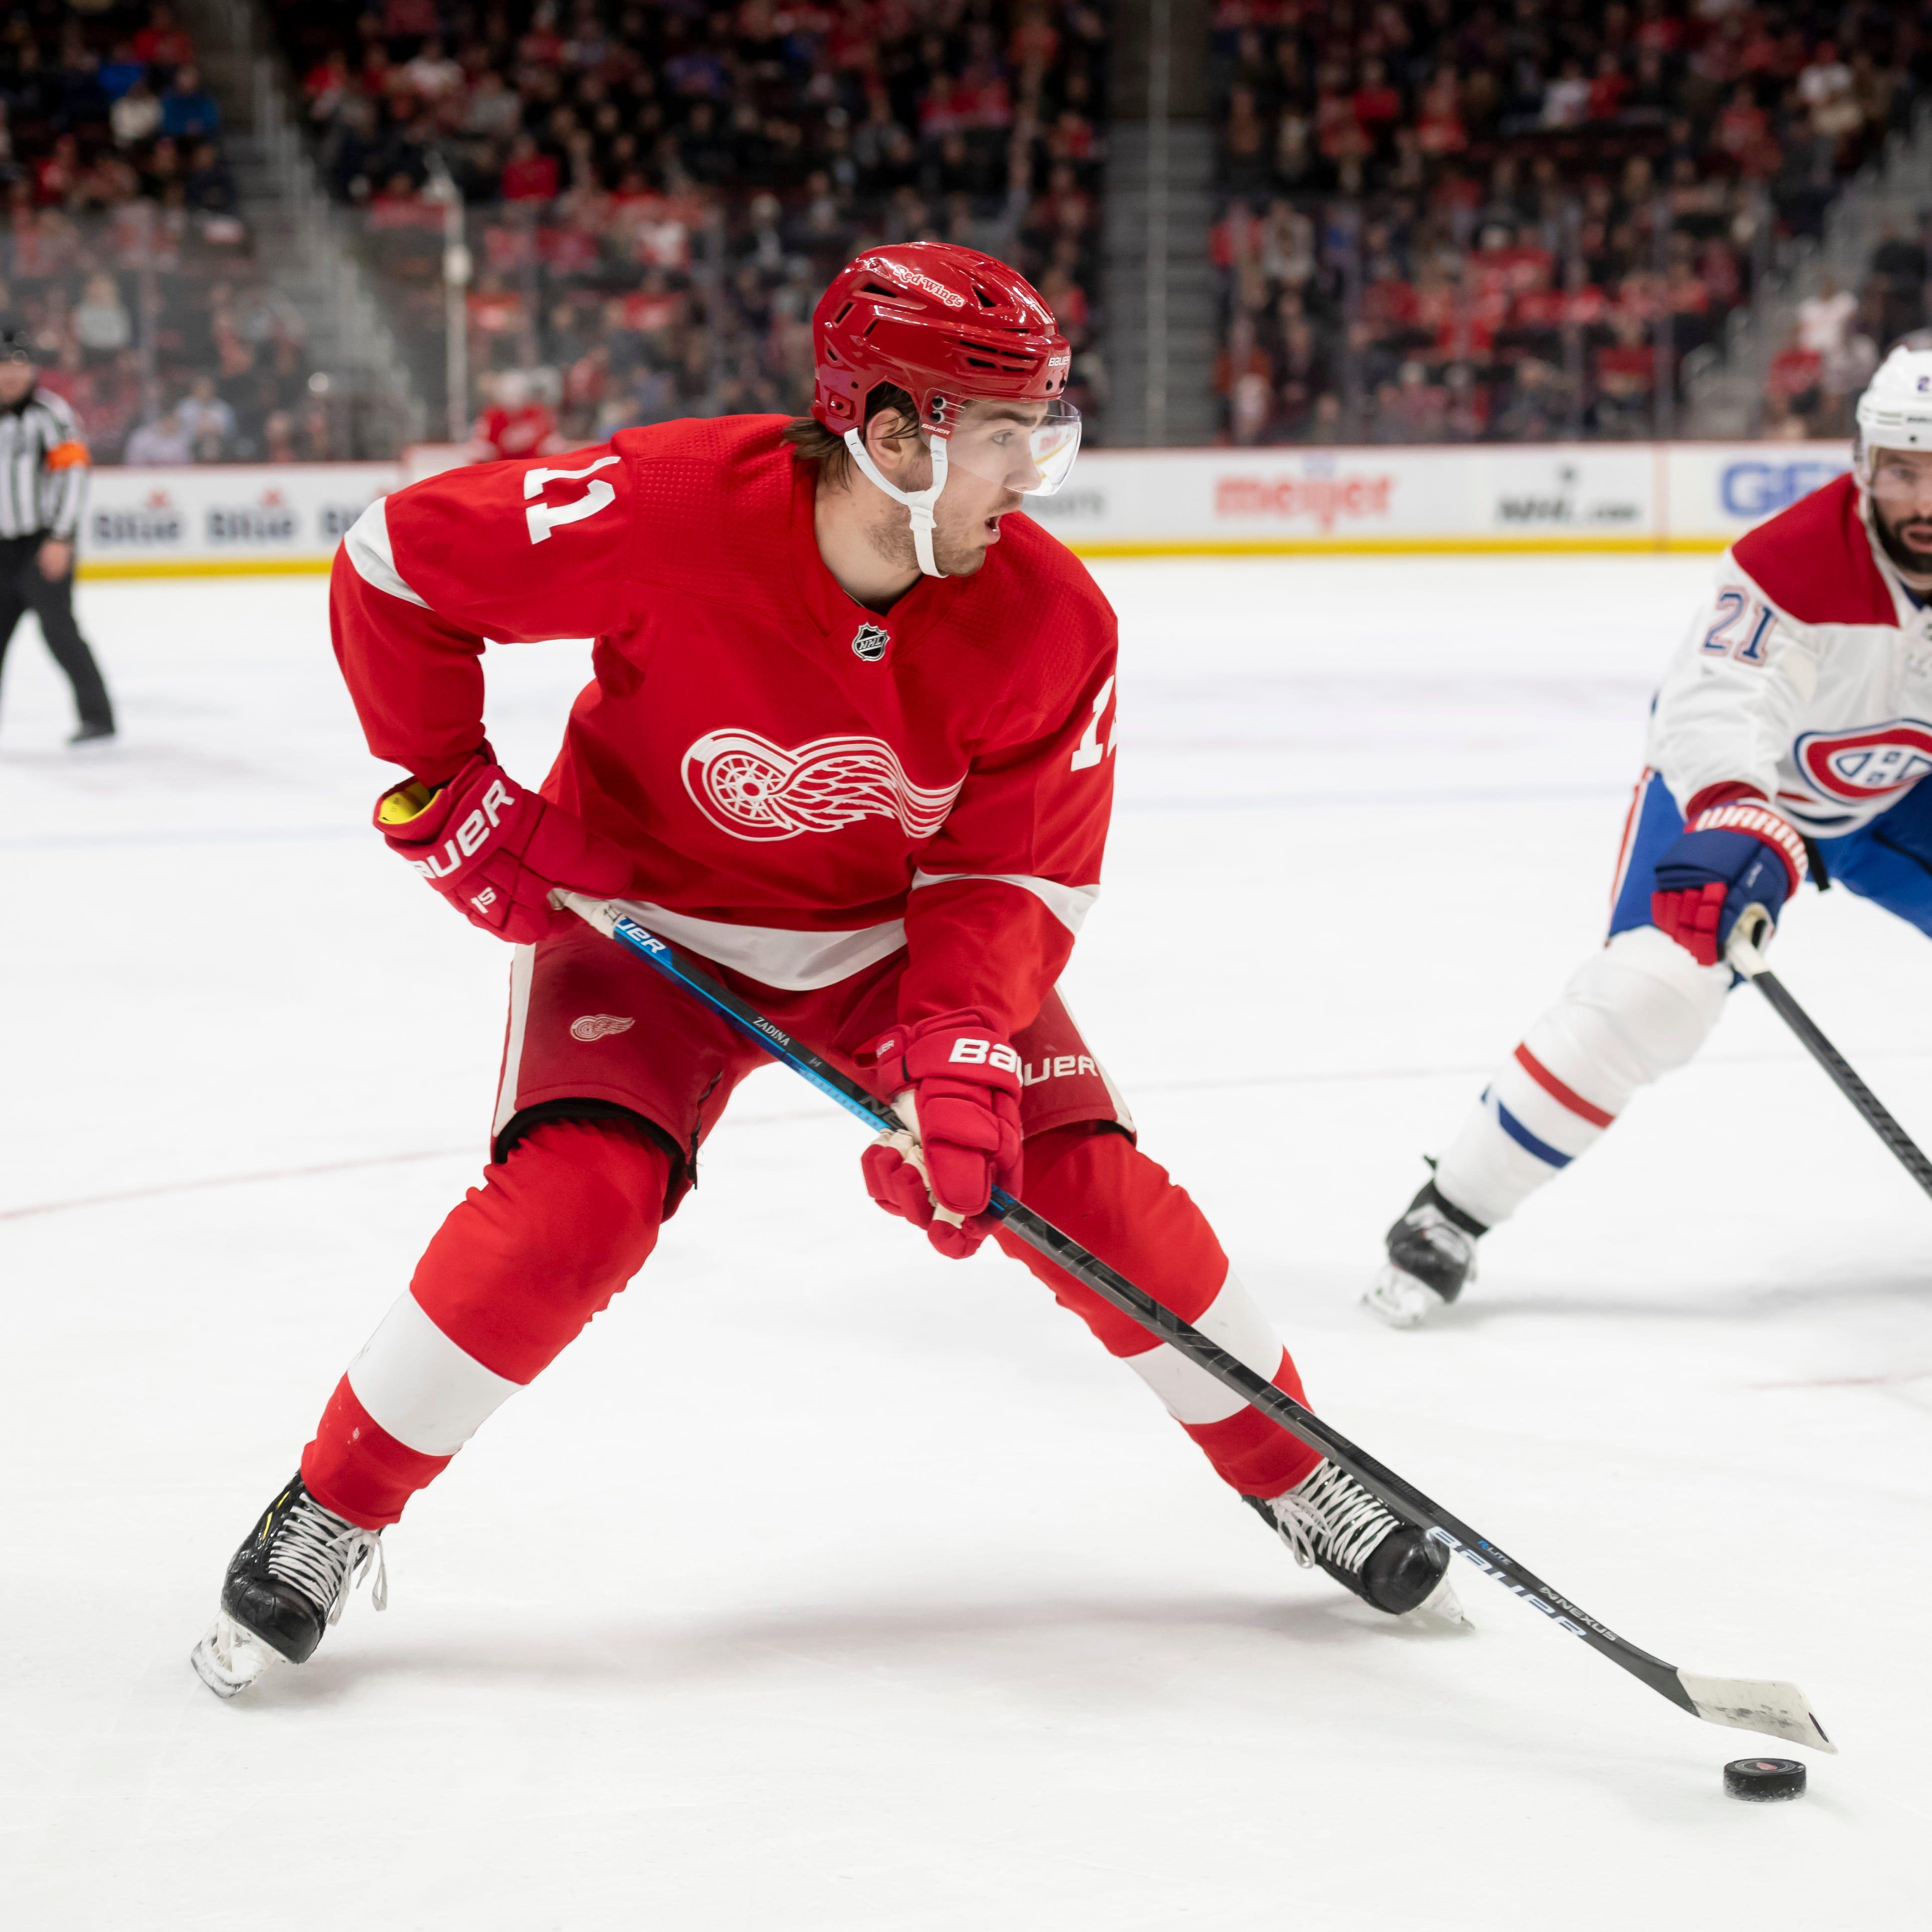 Red Wings hopeful Filip Zadina can pattern game after Tampa Bay star Nikita Kucherov